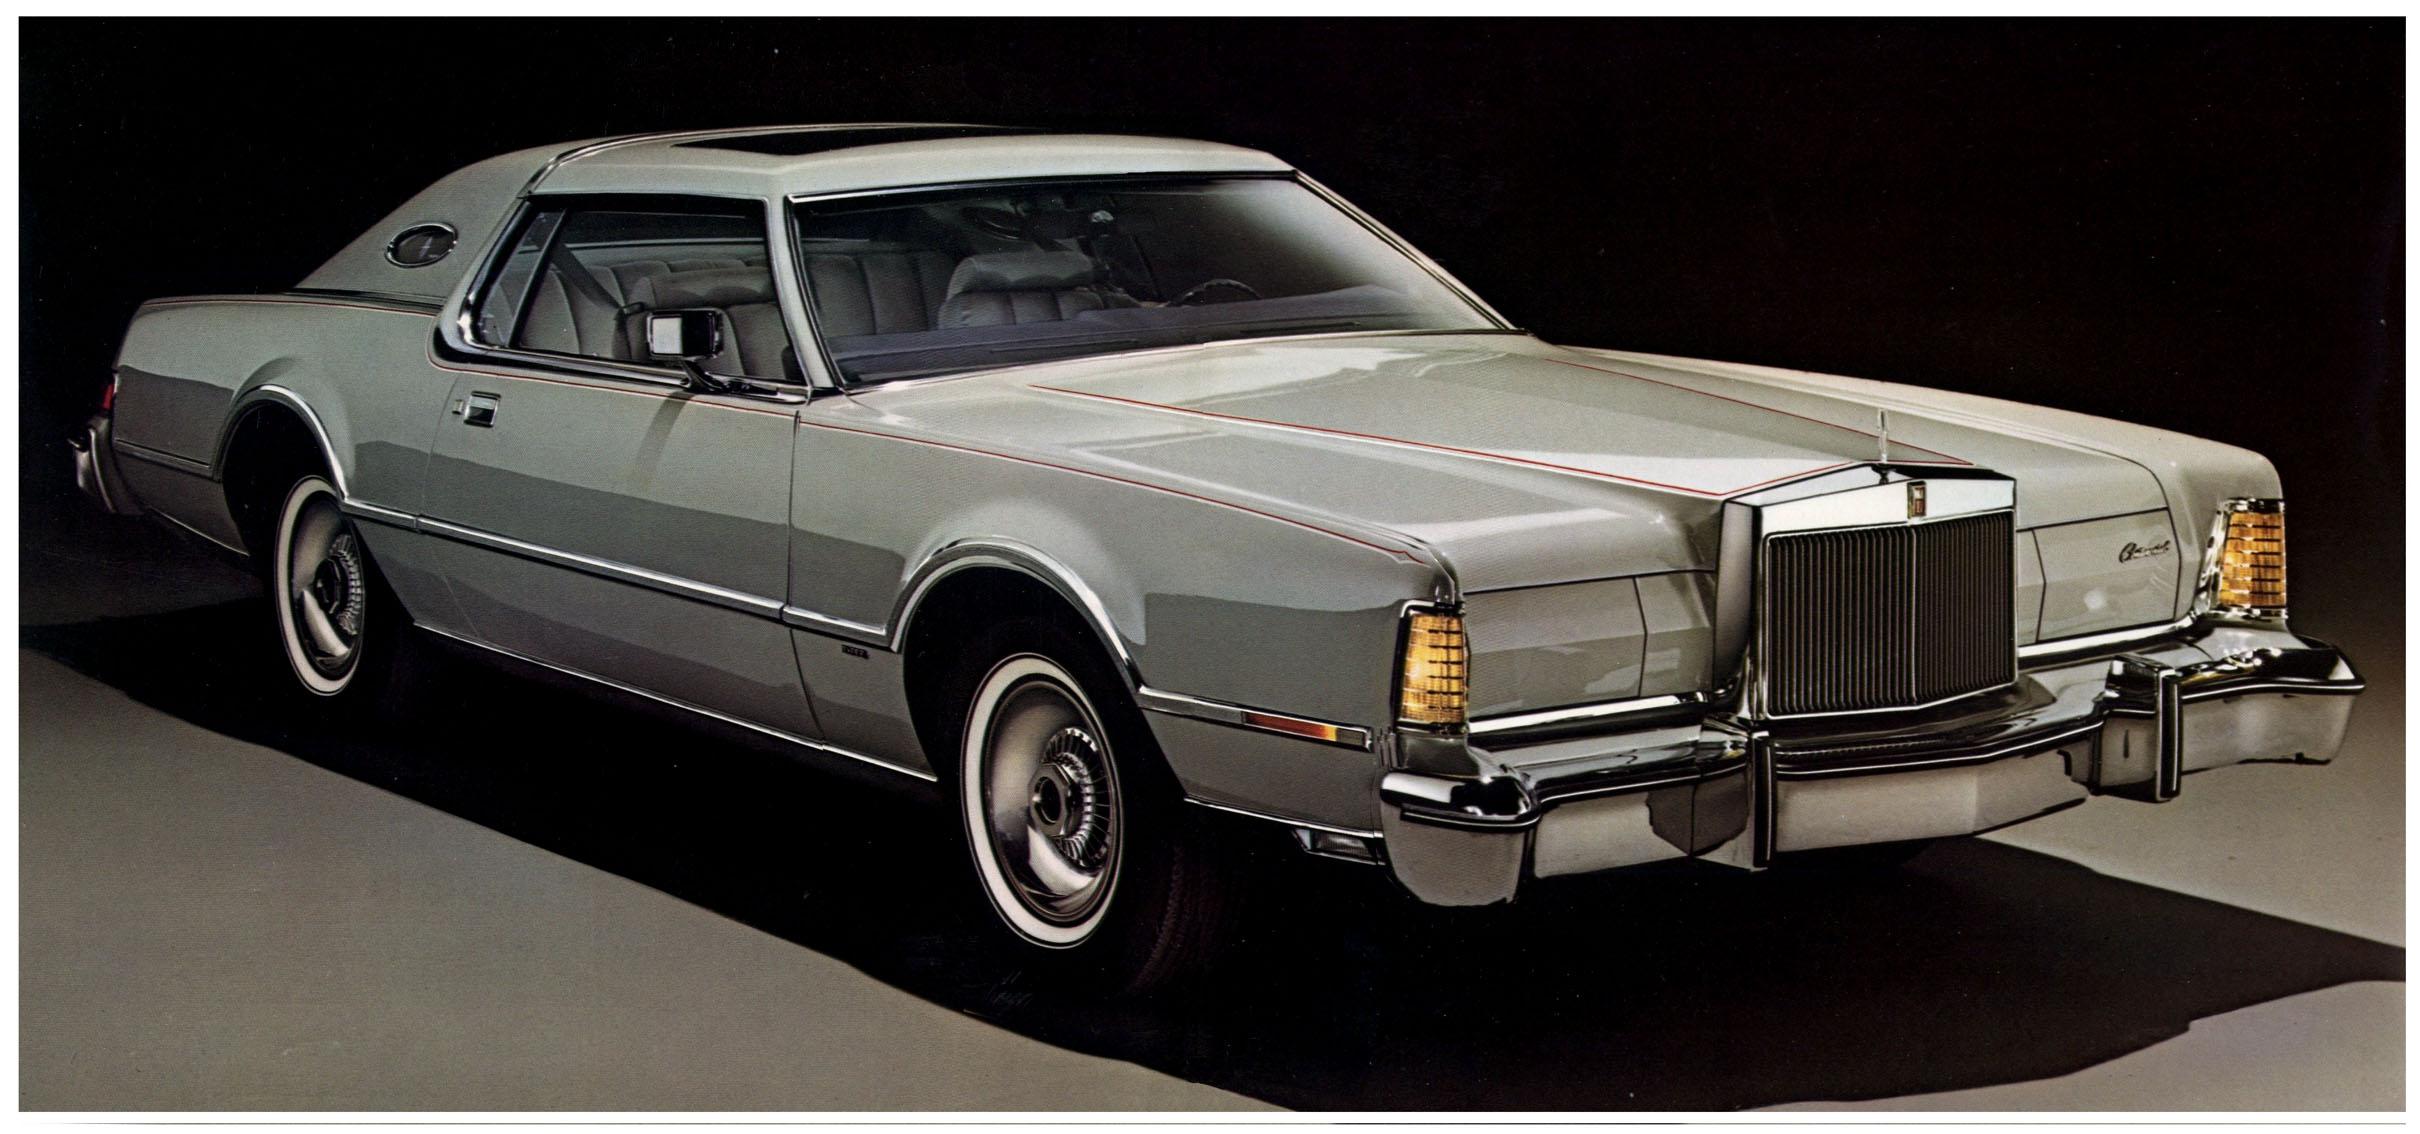 1975 Lincoln Town Car Cartier